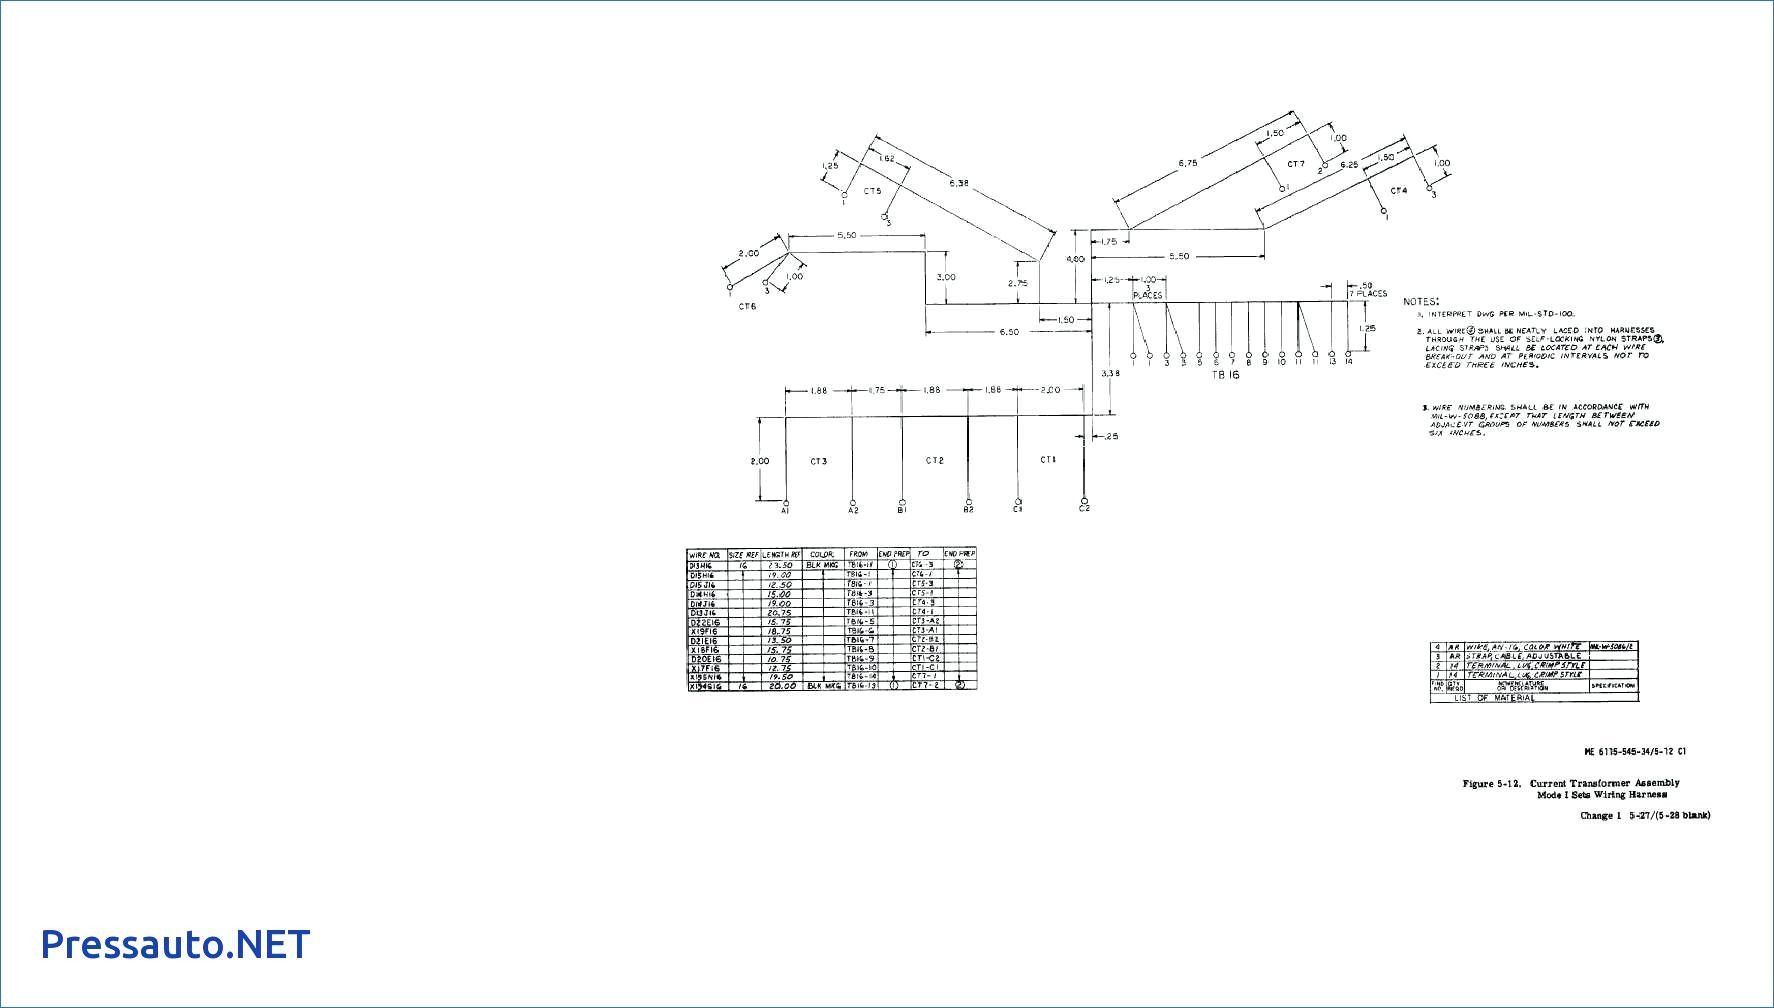 hight resolution of kdc 148 wiring harness schematics wiring diagramwrg 2891 kenwood kdc 148 am wiring diagramkenwood kdc